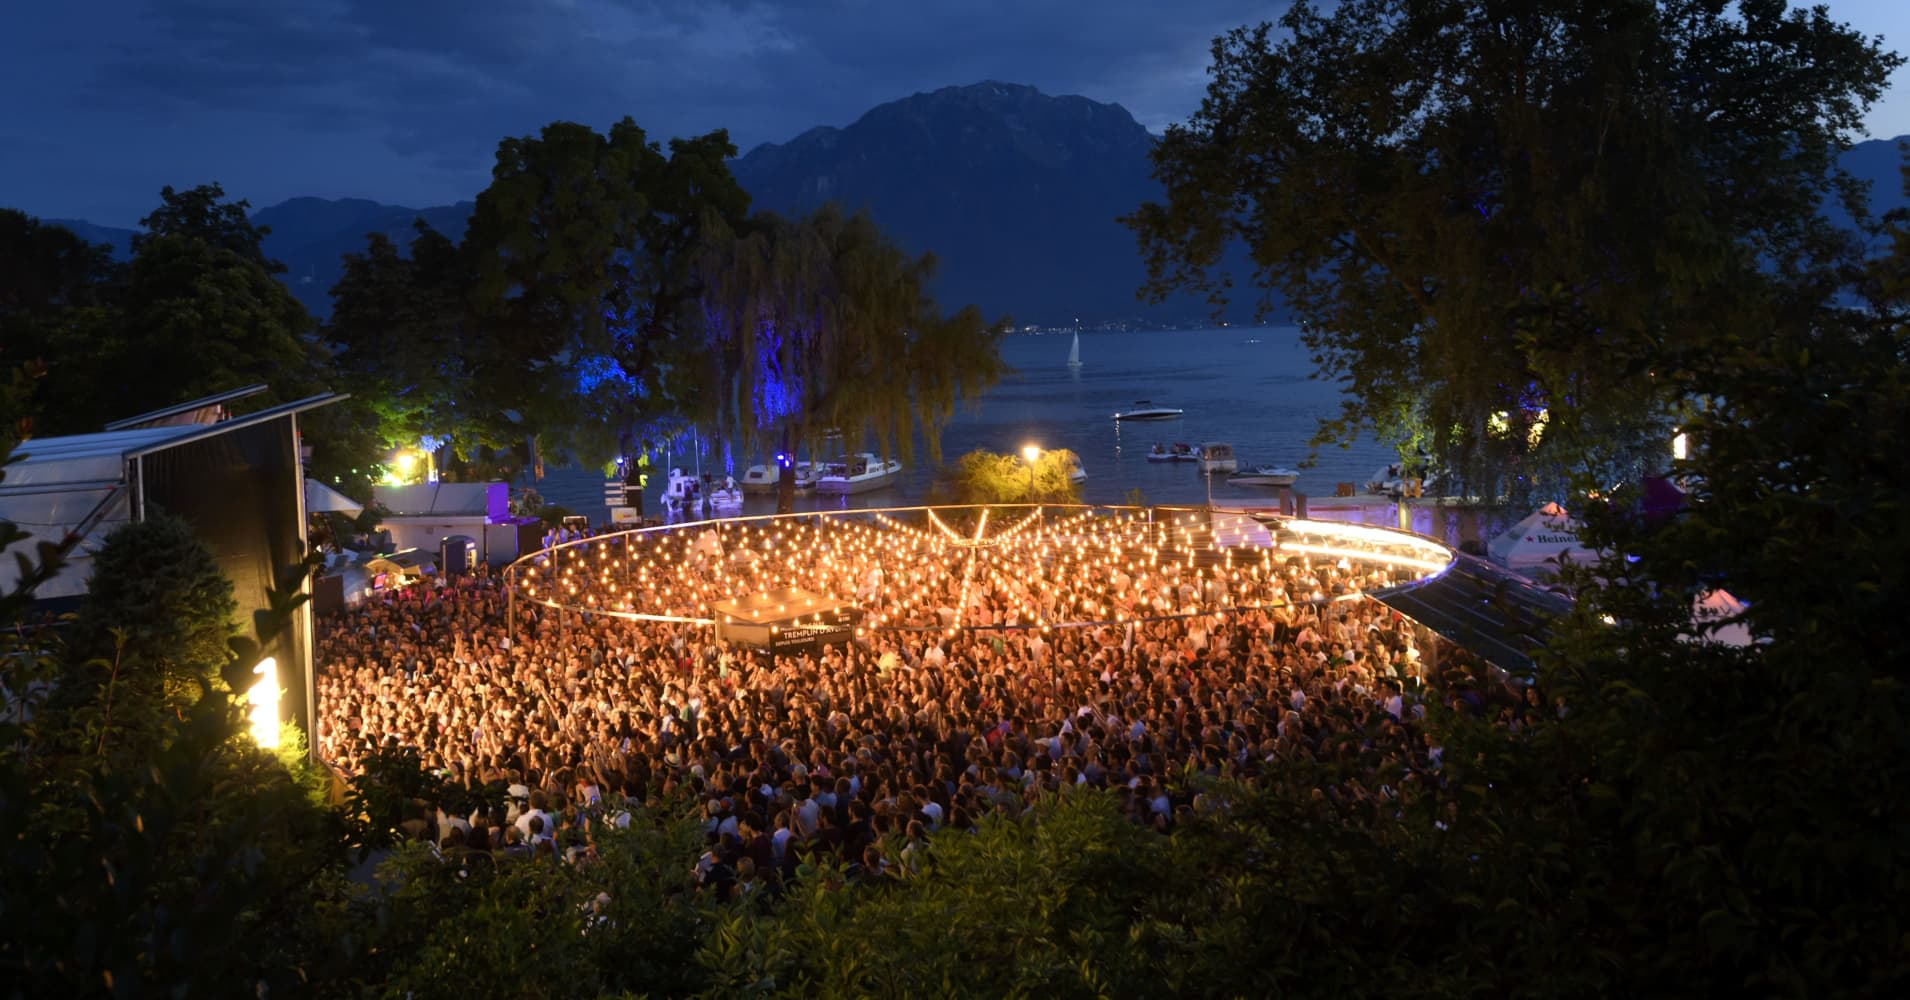 Montreux Jazz Festival >> Montreux Jazz Festival expands its brand to Singapore, Brazil